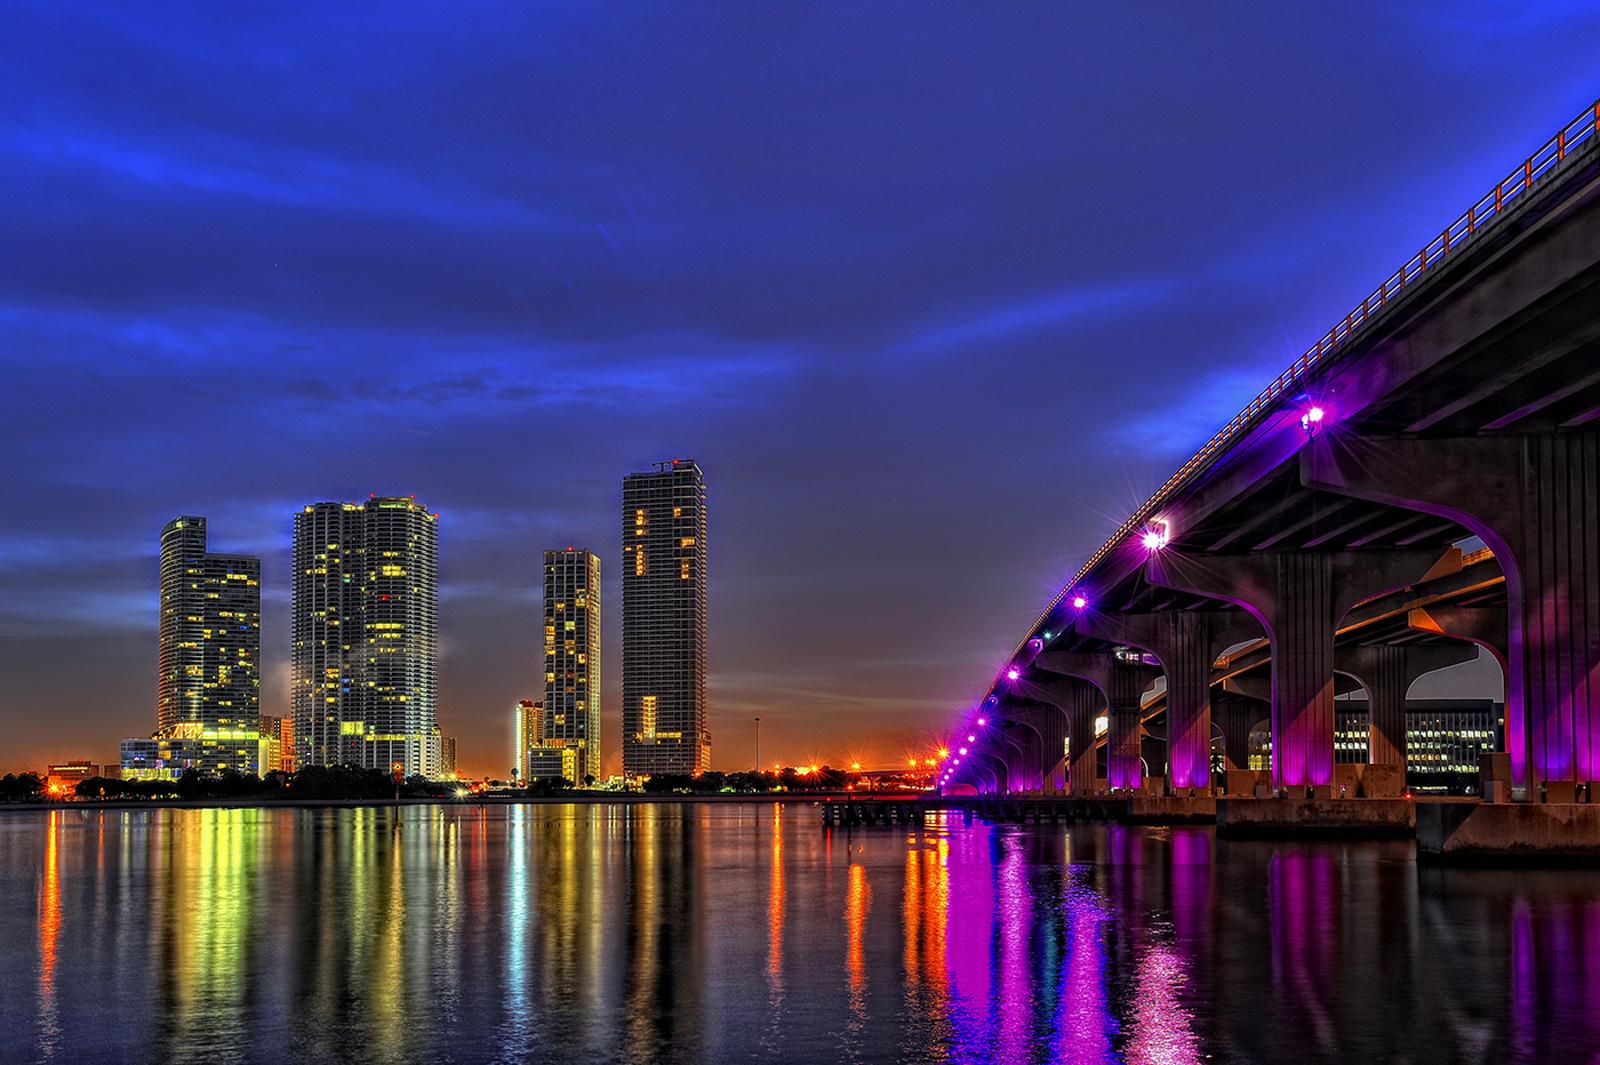 Igniting Miami's startup culture